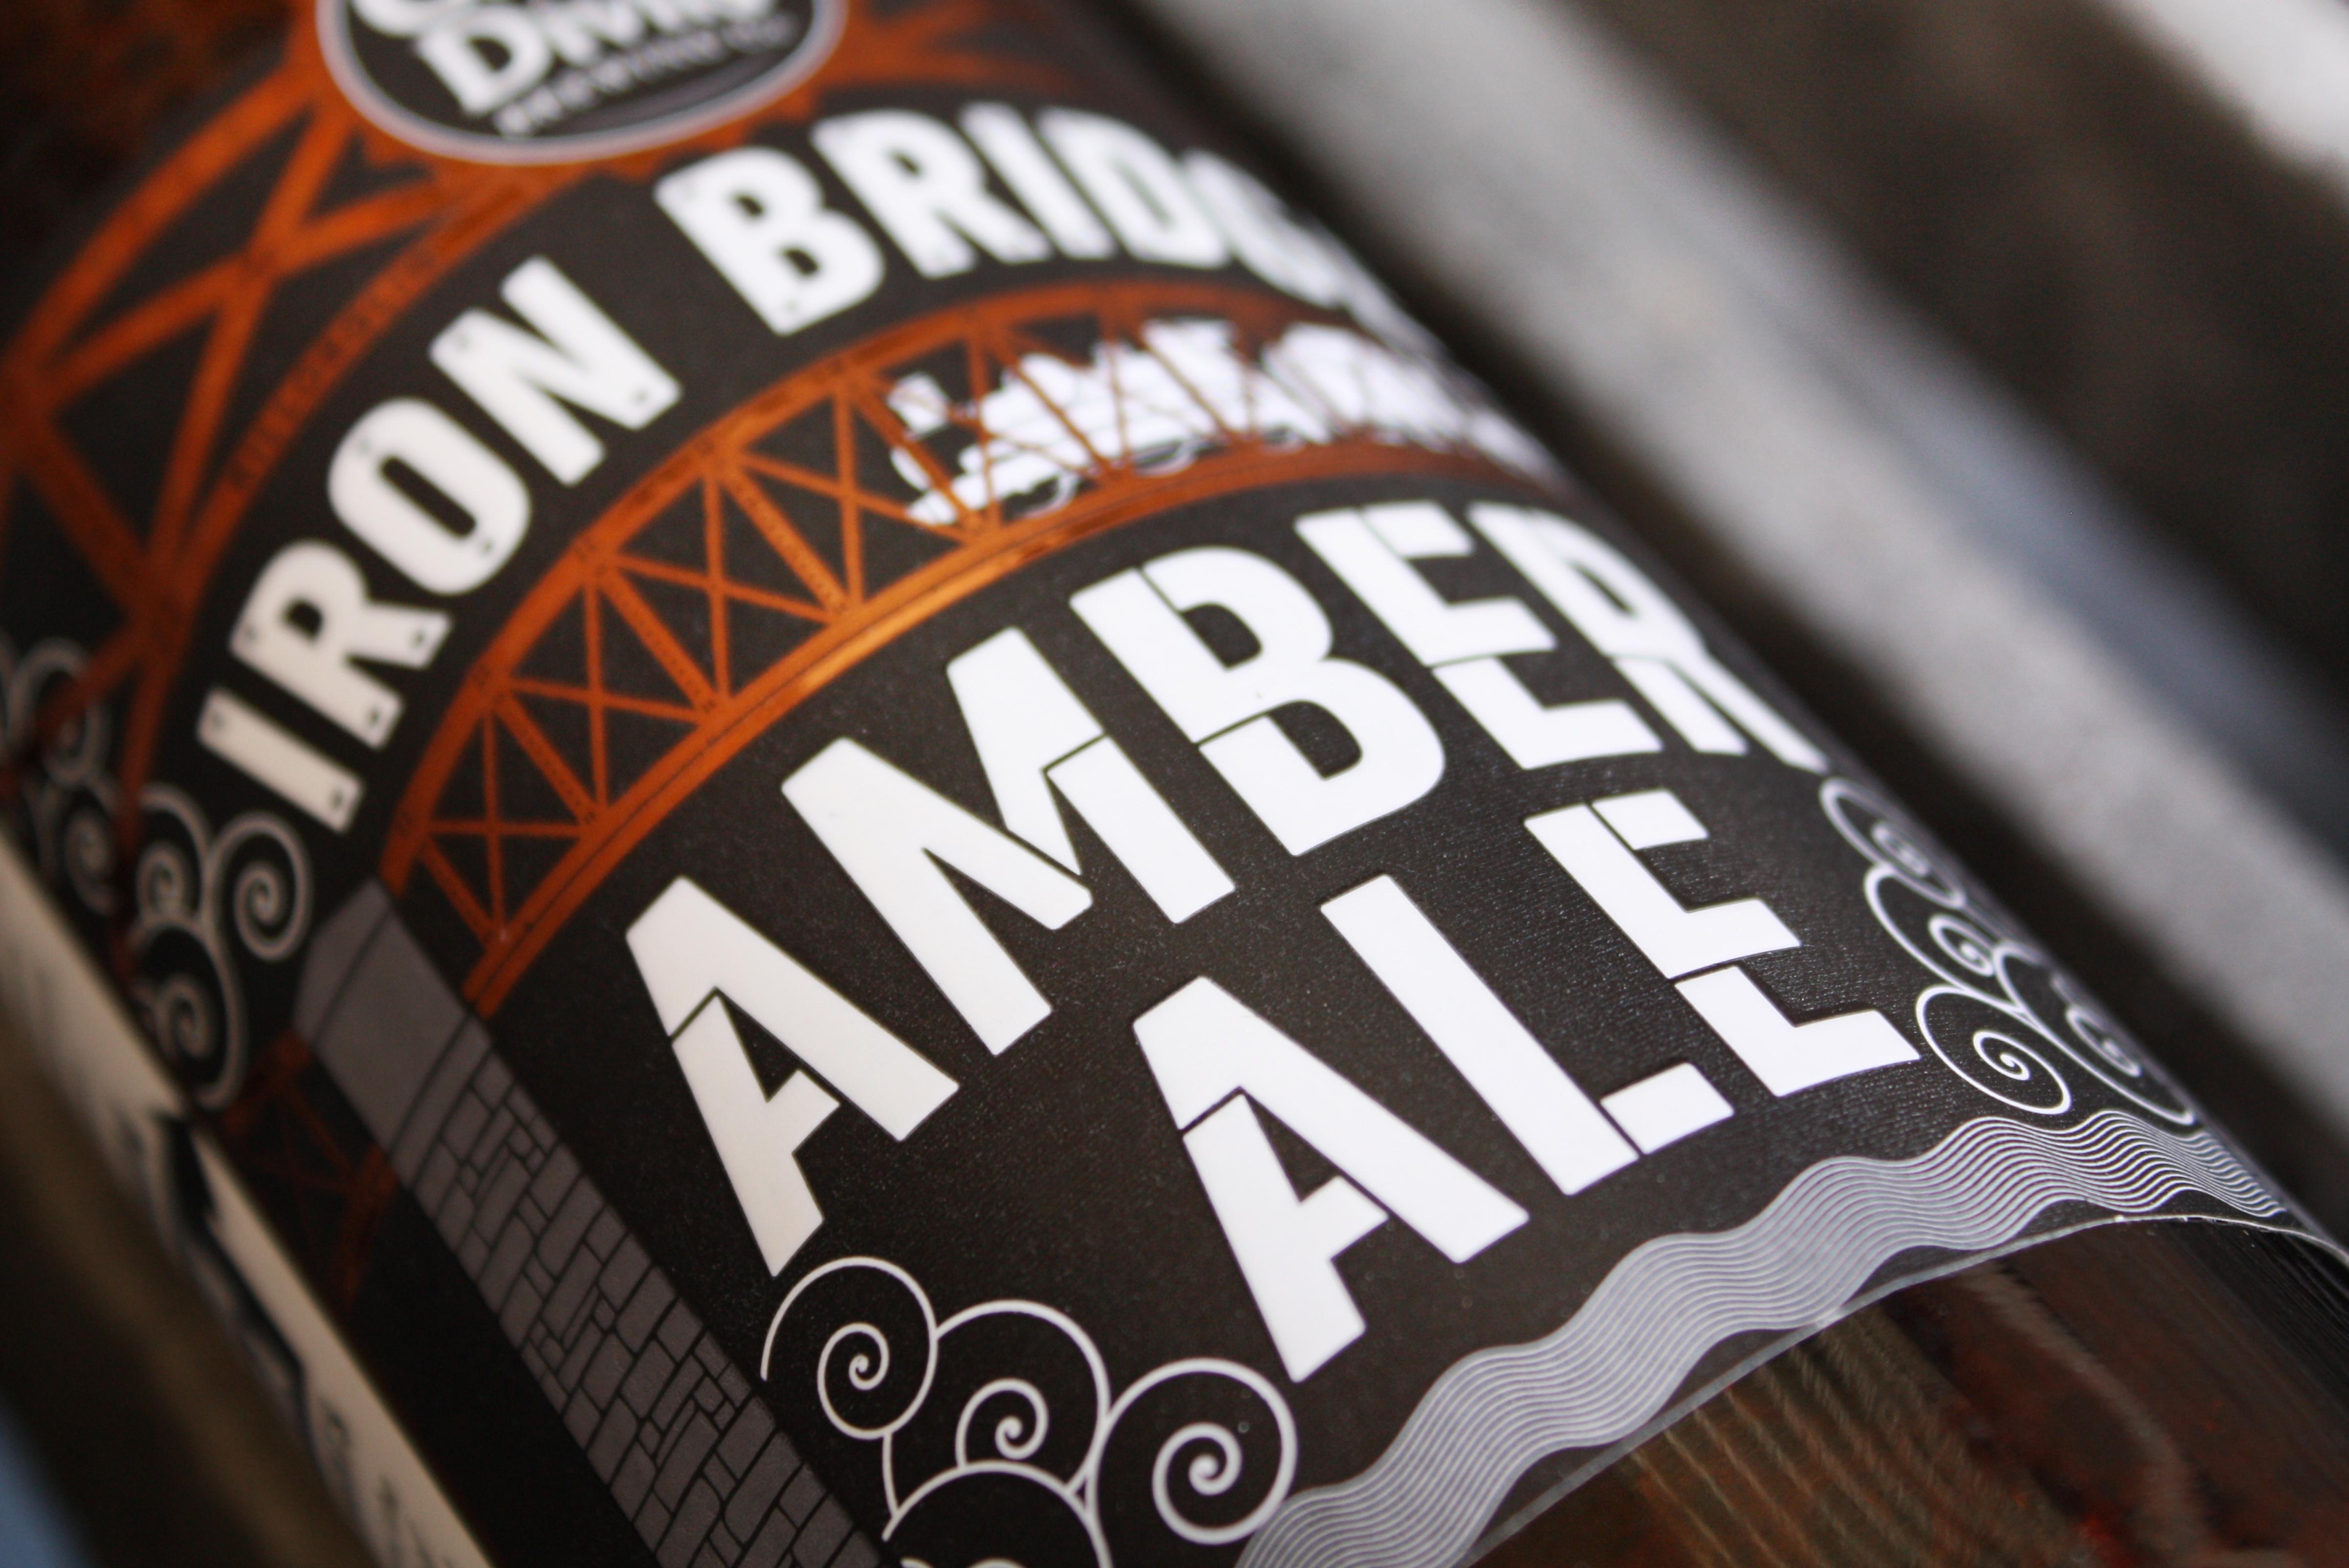 Cover image: Iron Bridge Amber Ale